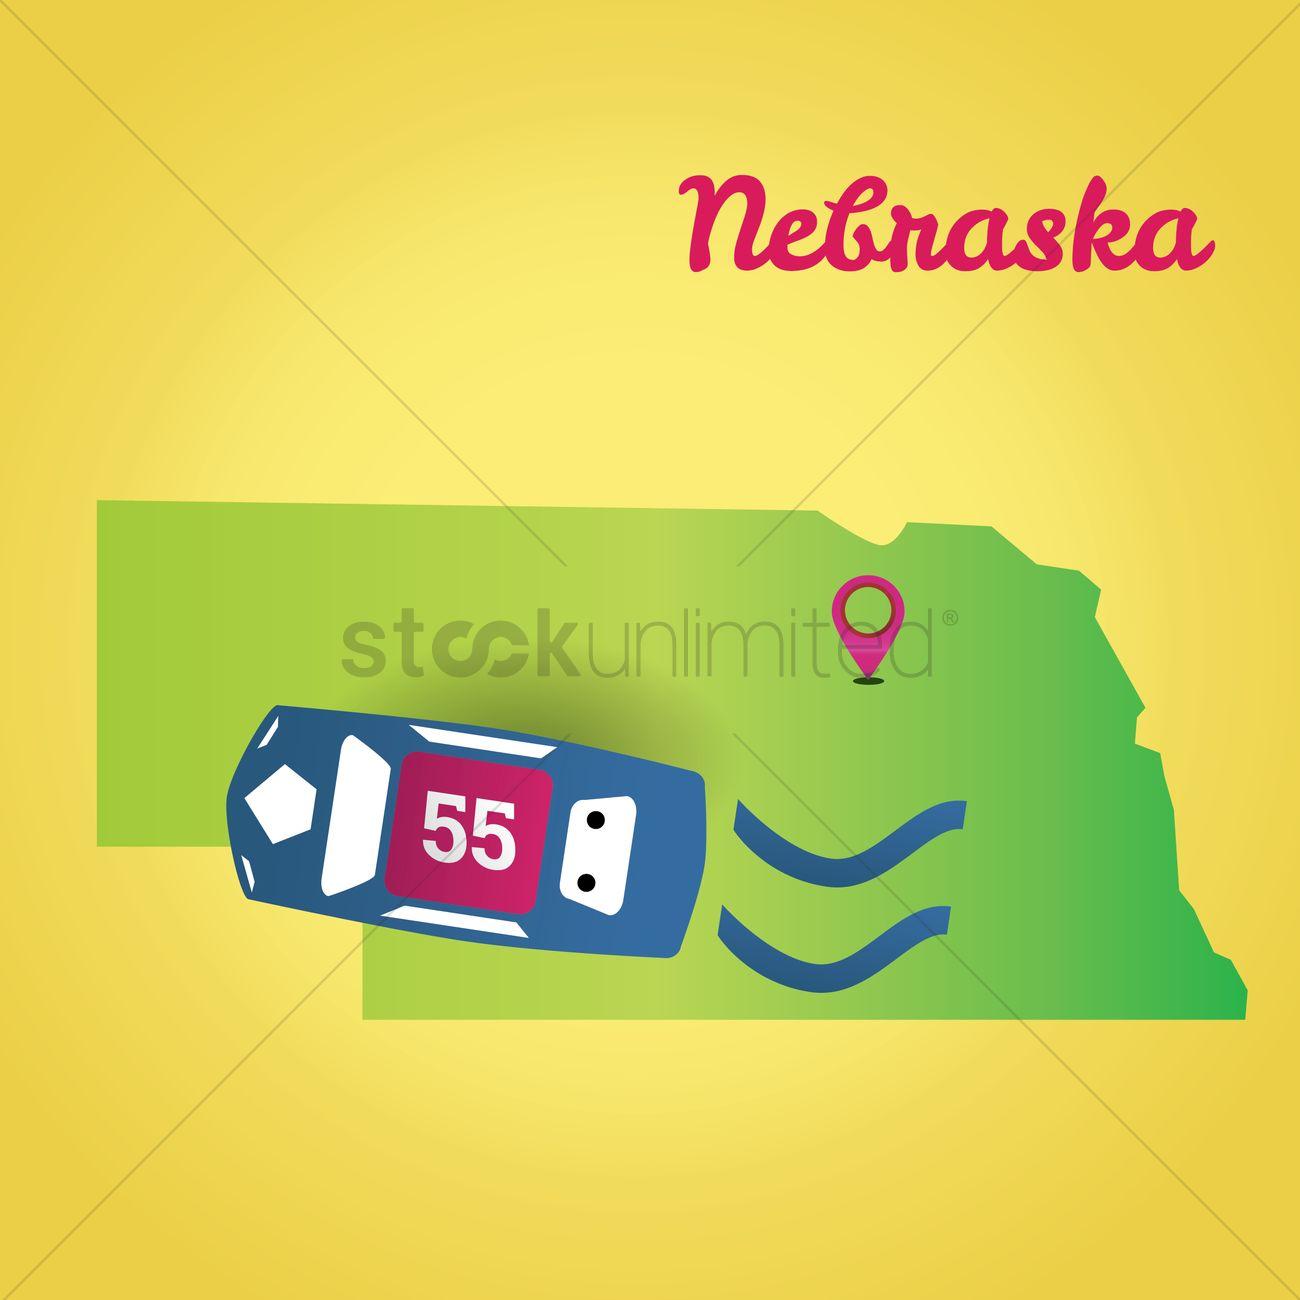 Map of nebraska state Vector Image - 1535618 | StockUnlimited